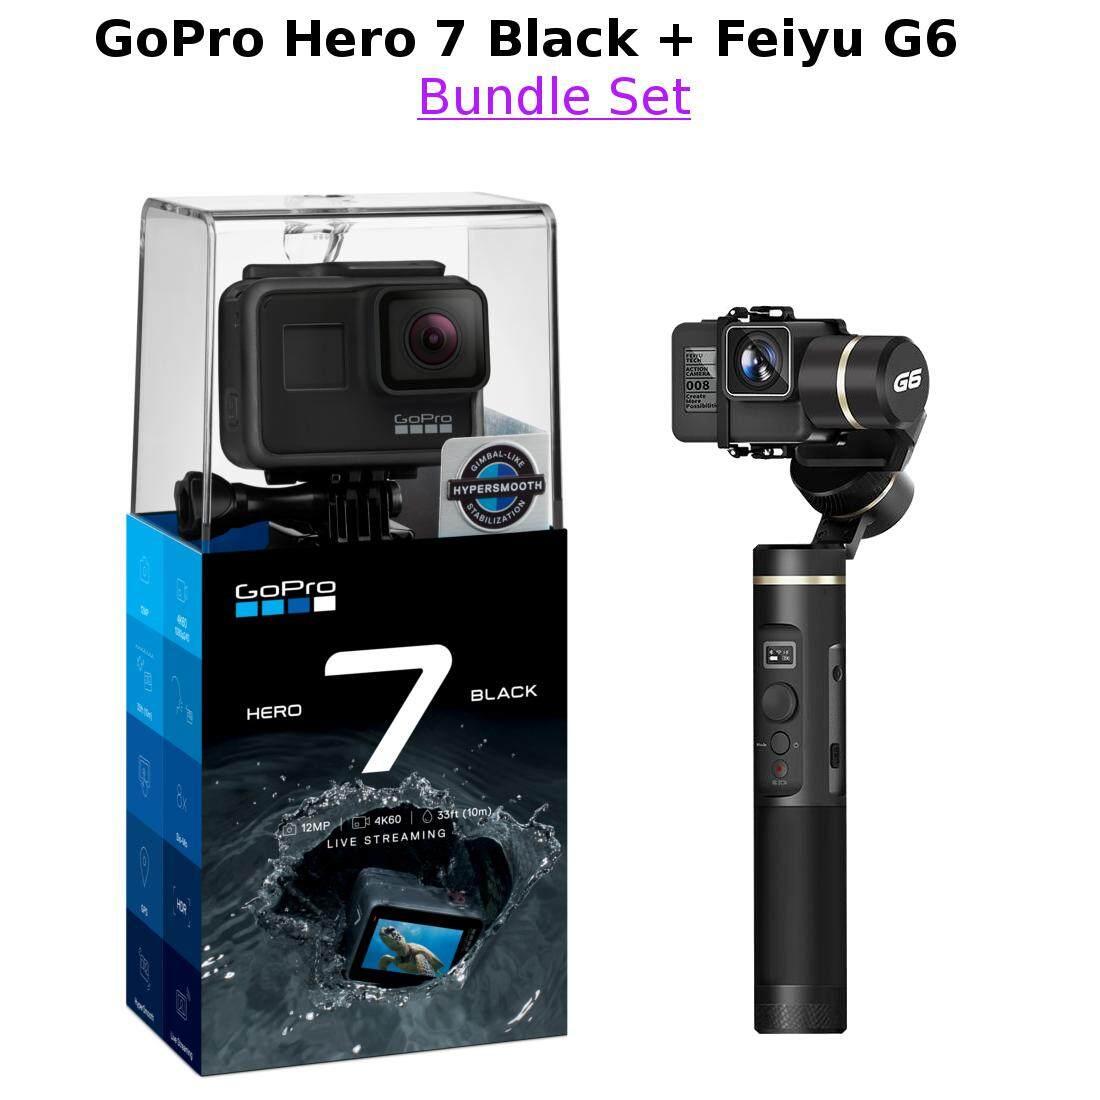 GoPro Hero 7 Black + Feiyu G6 3-Axis Stabilized Handheld Gimbal for action  camera